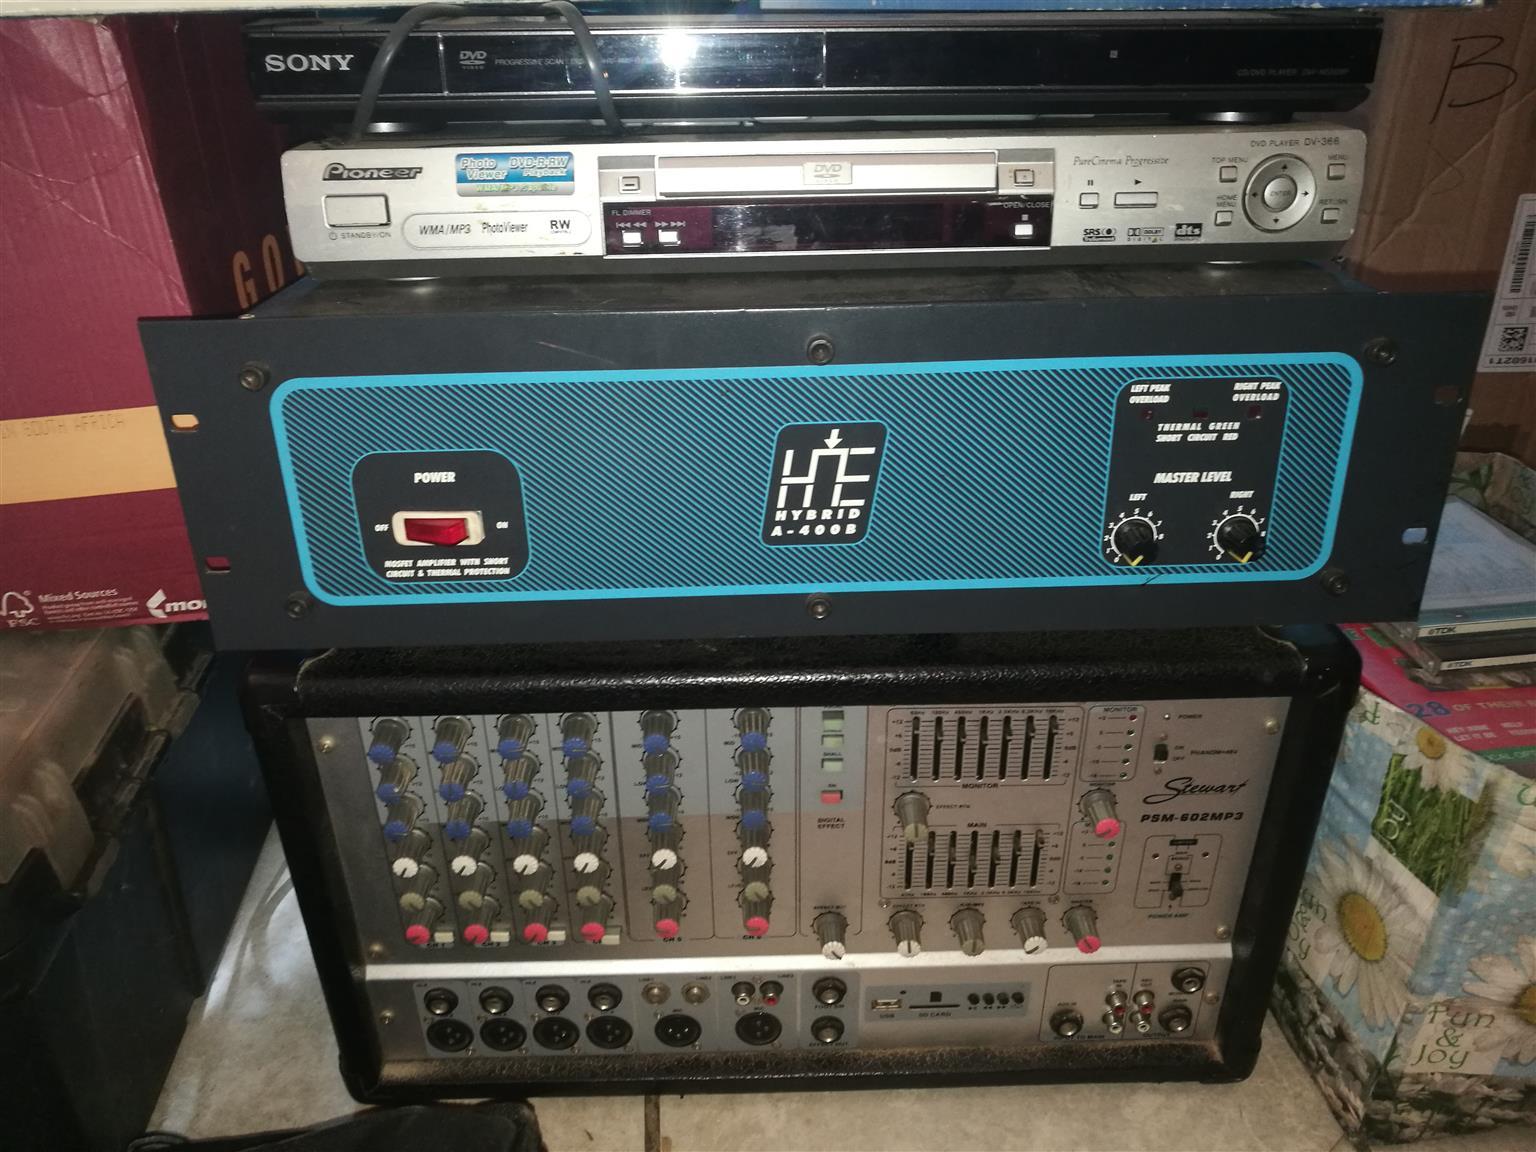 Mobile disco karaoke system